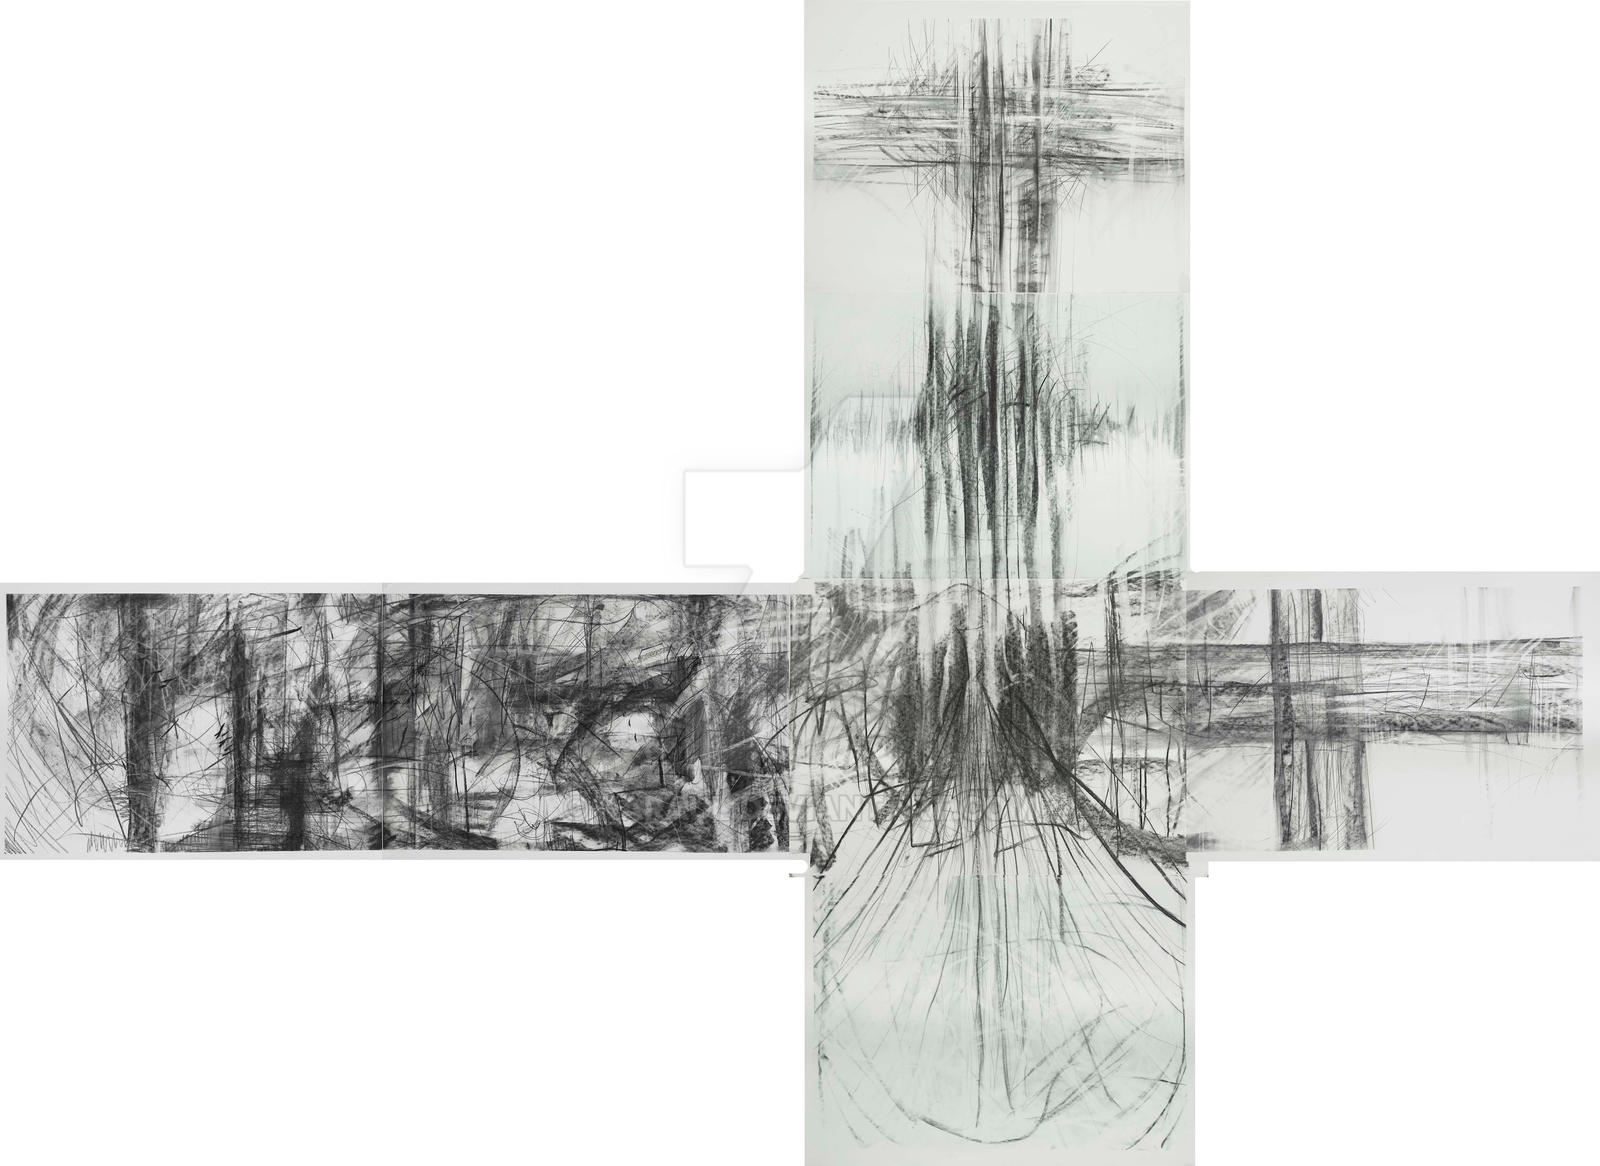 Dante Alighieri: The Cross by Karaul